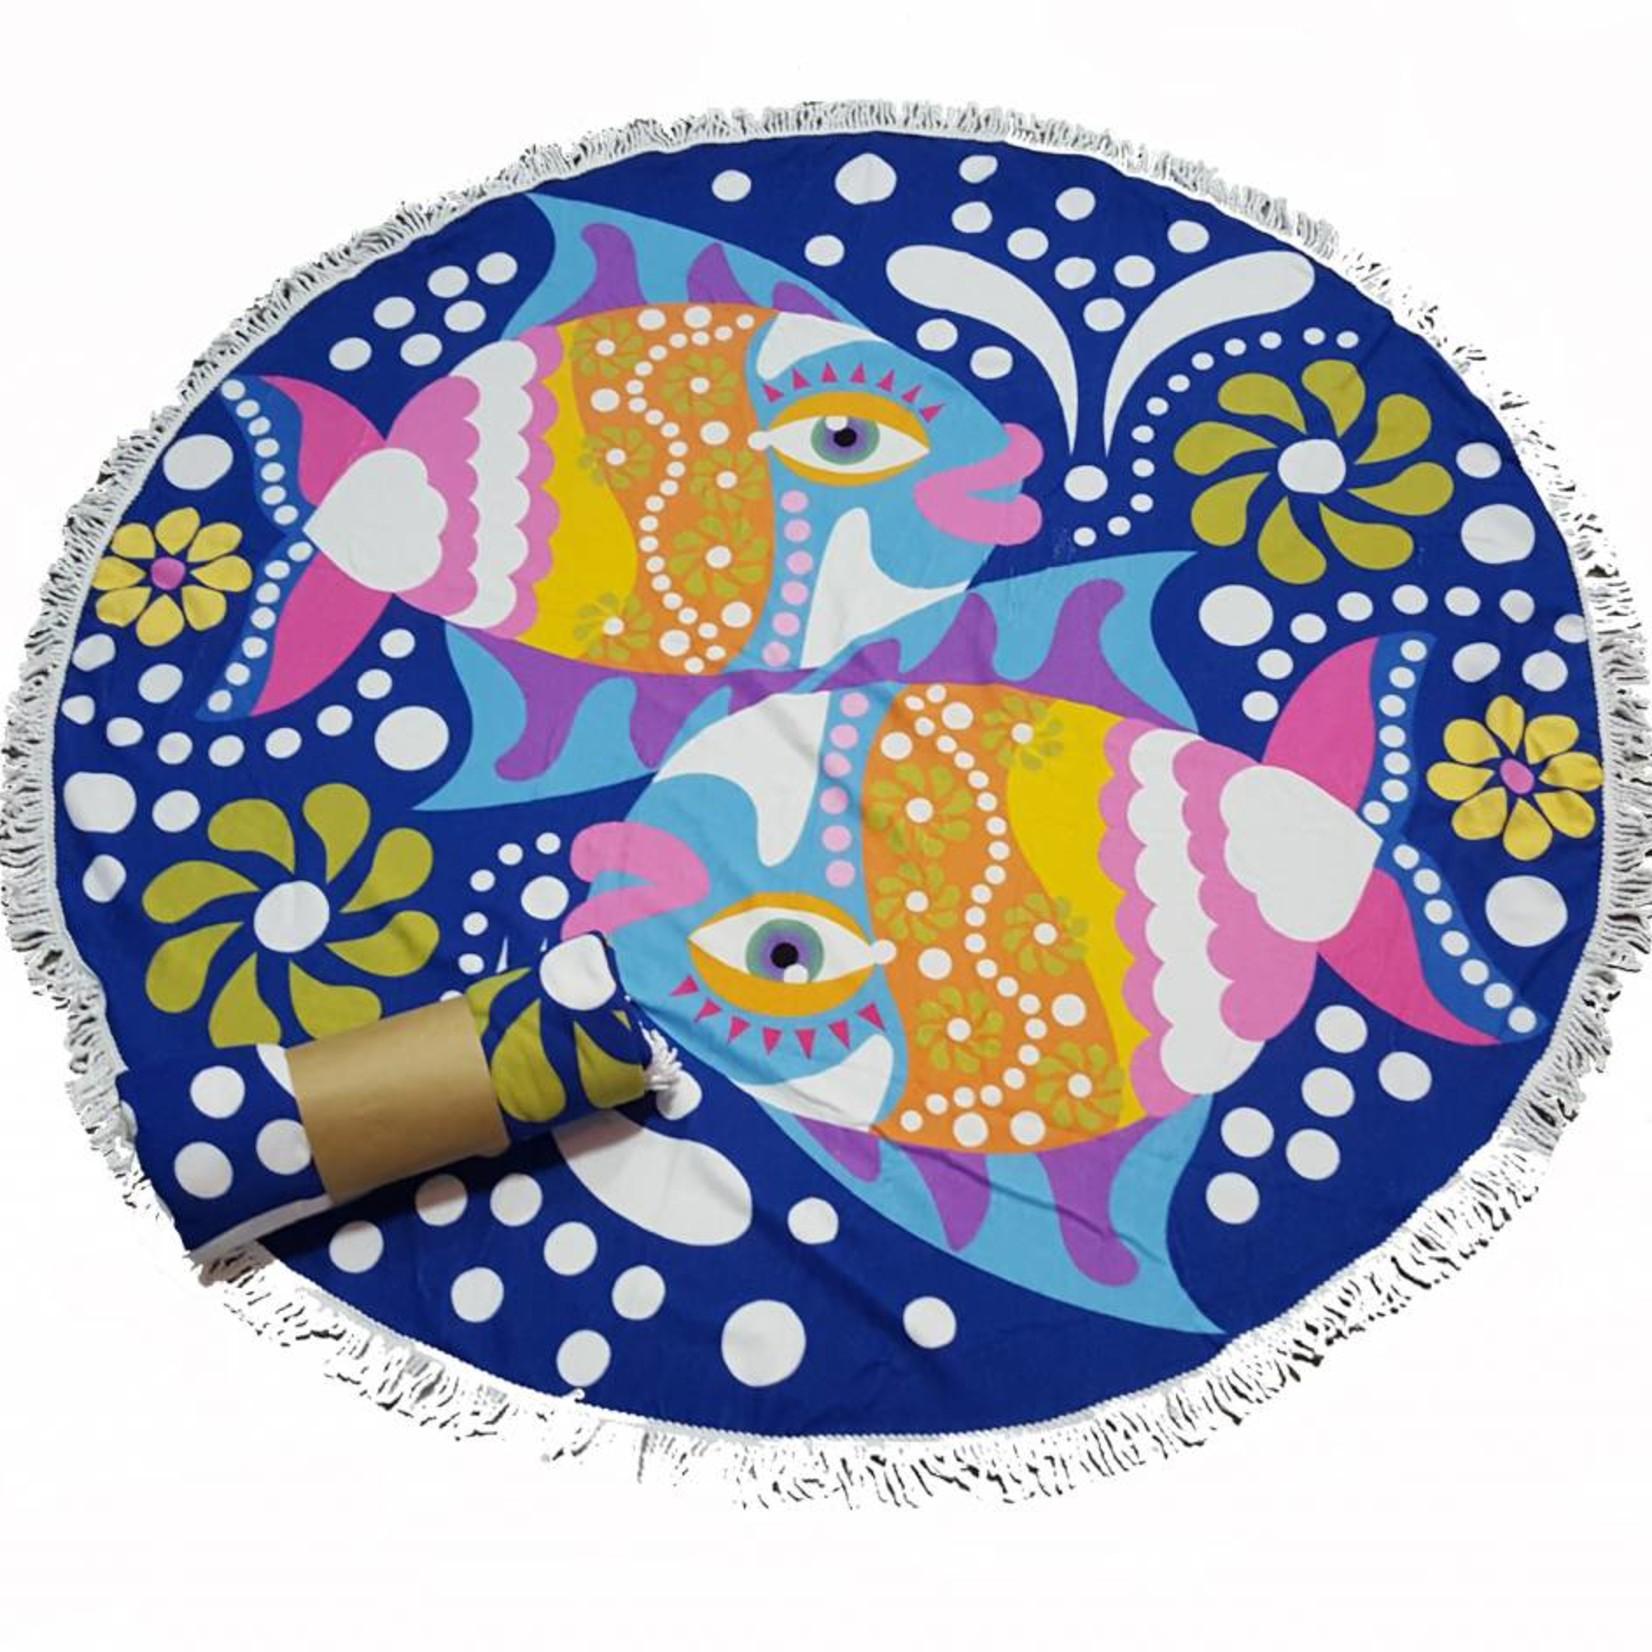 Roundie beach towel - rond strandlaken - badstof- boho - Ibiza handdoek bali stijl - Blue Fish